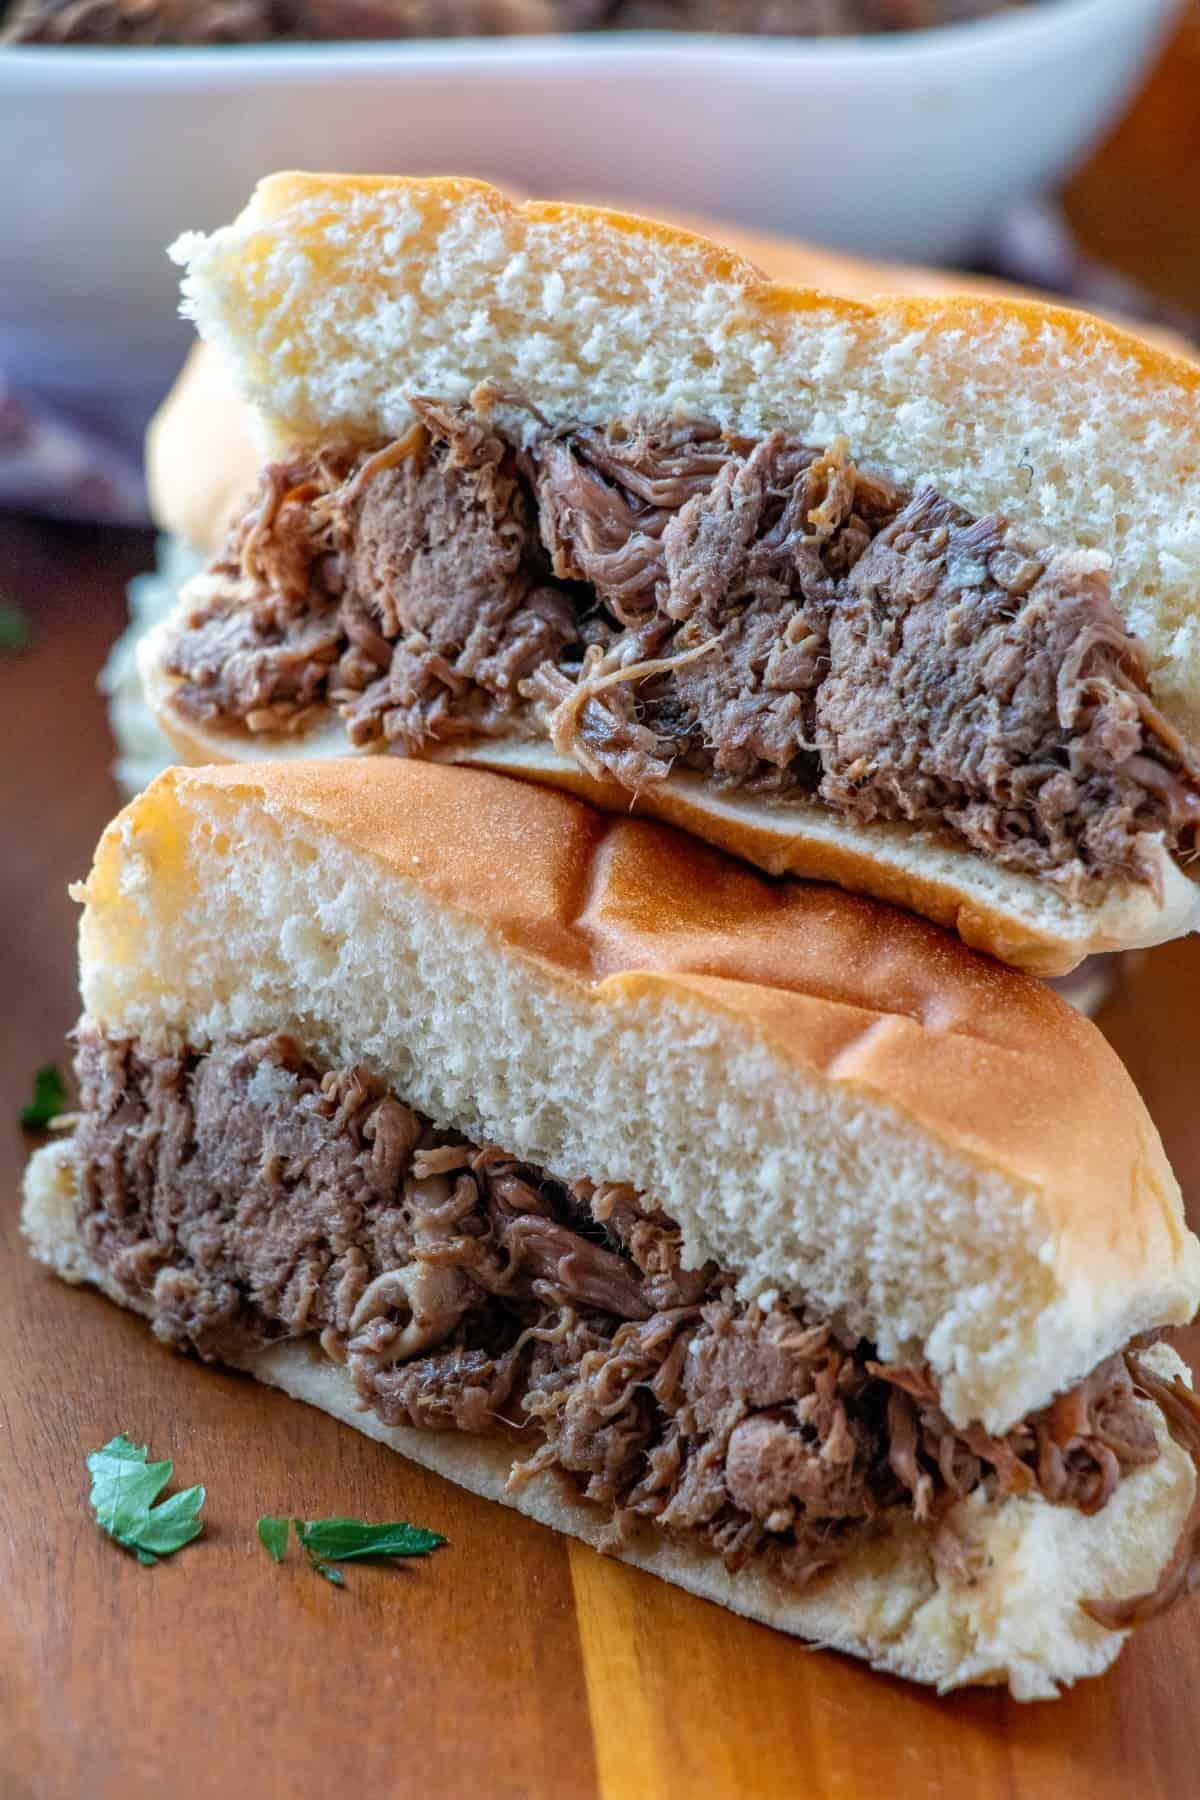 Beef dip sandwich cut in half